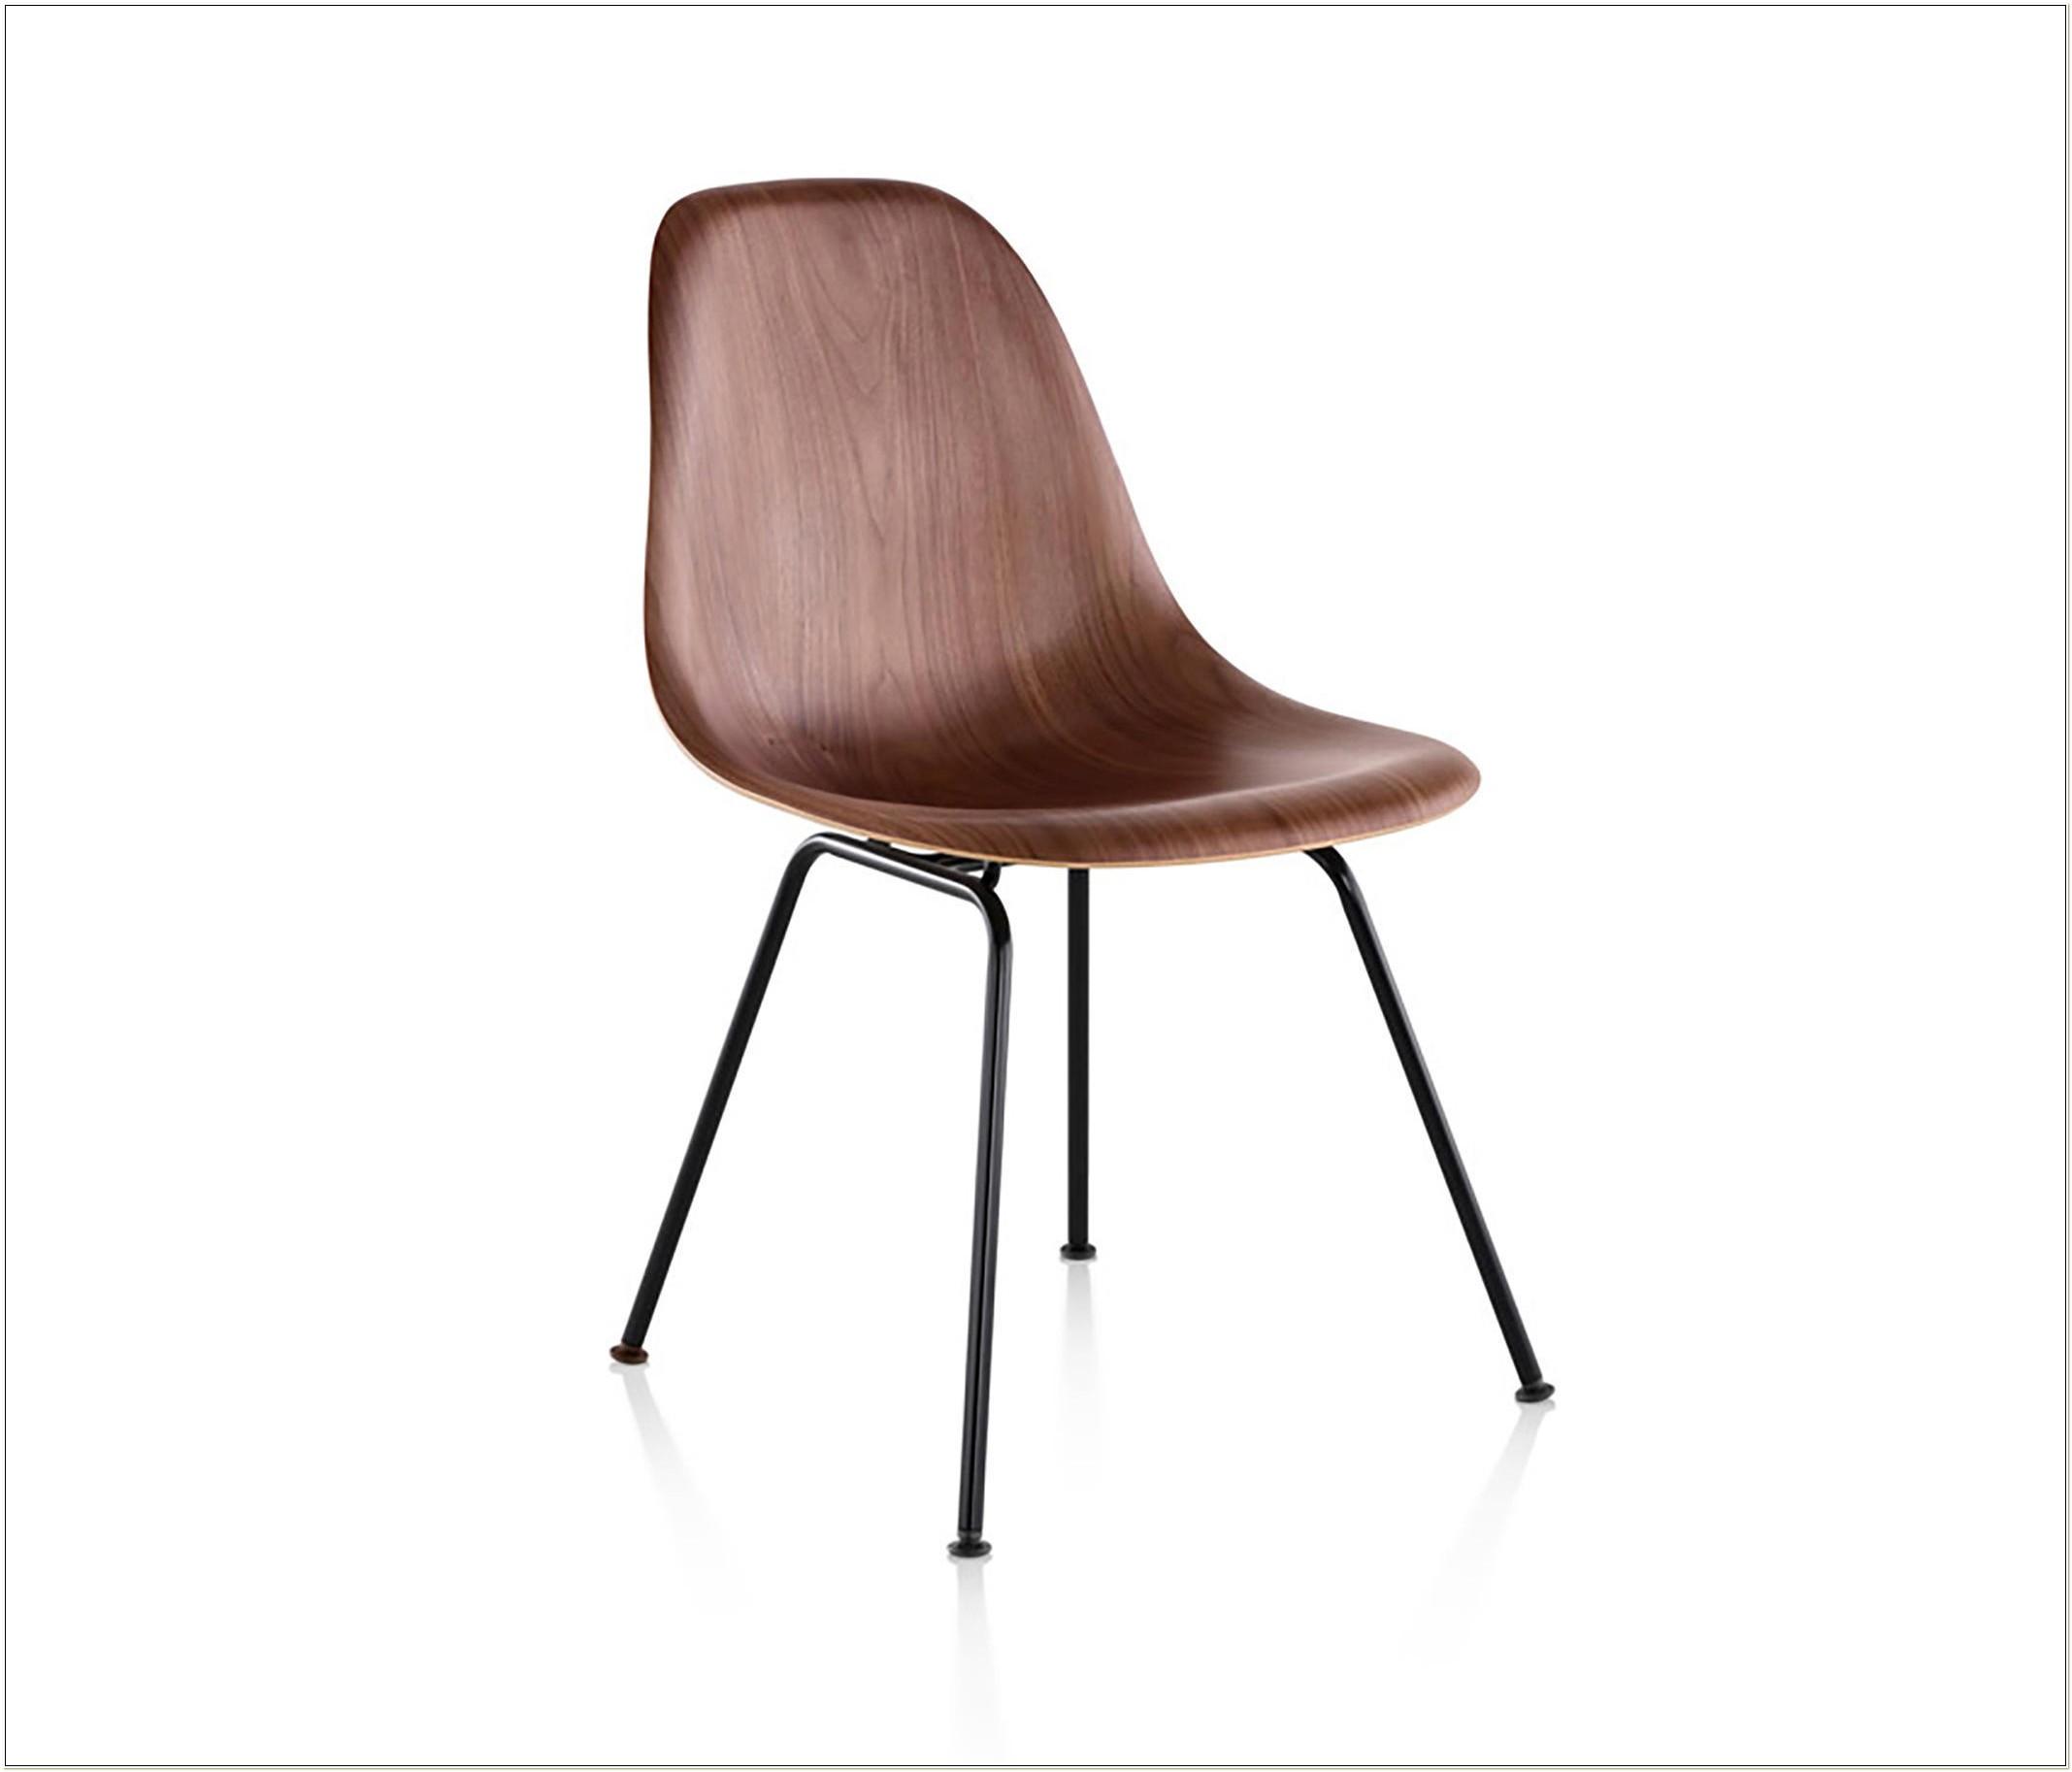 Herman Miller Molded Wood Side Chair